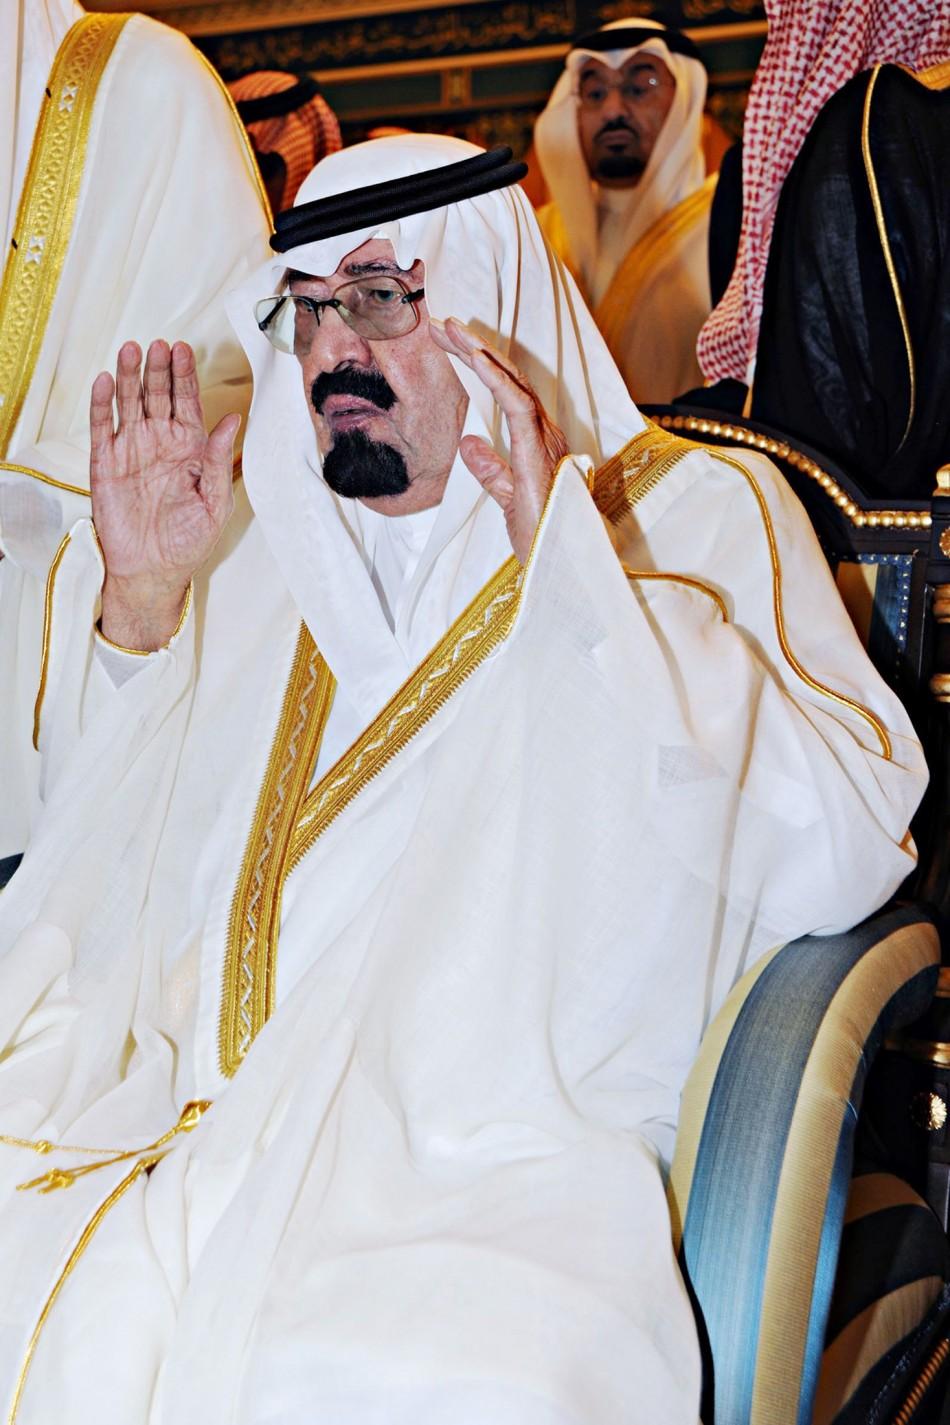 Saudi King Abdullah bin Abdulaziz Al Saud